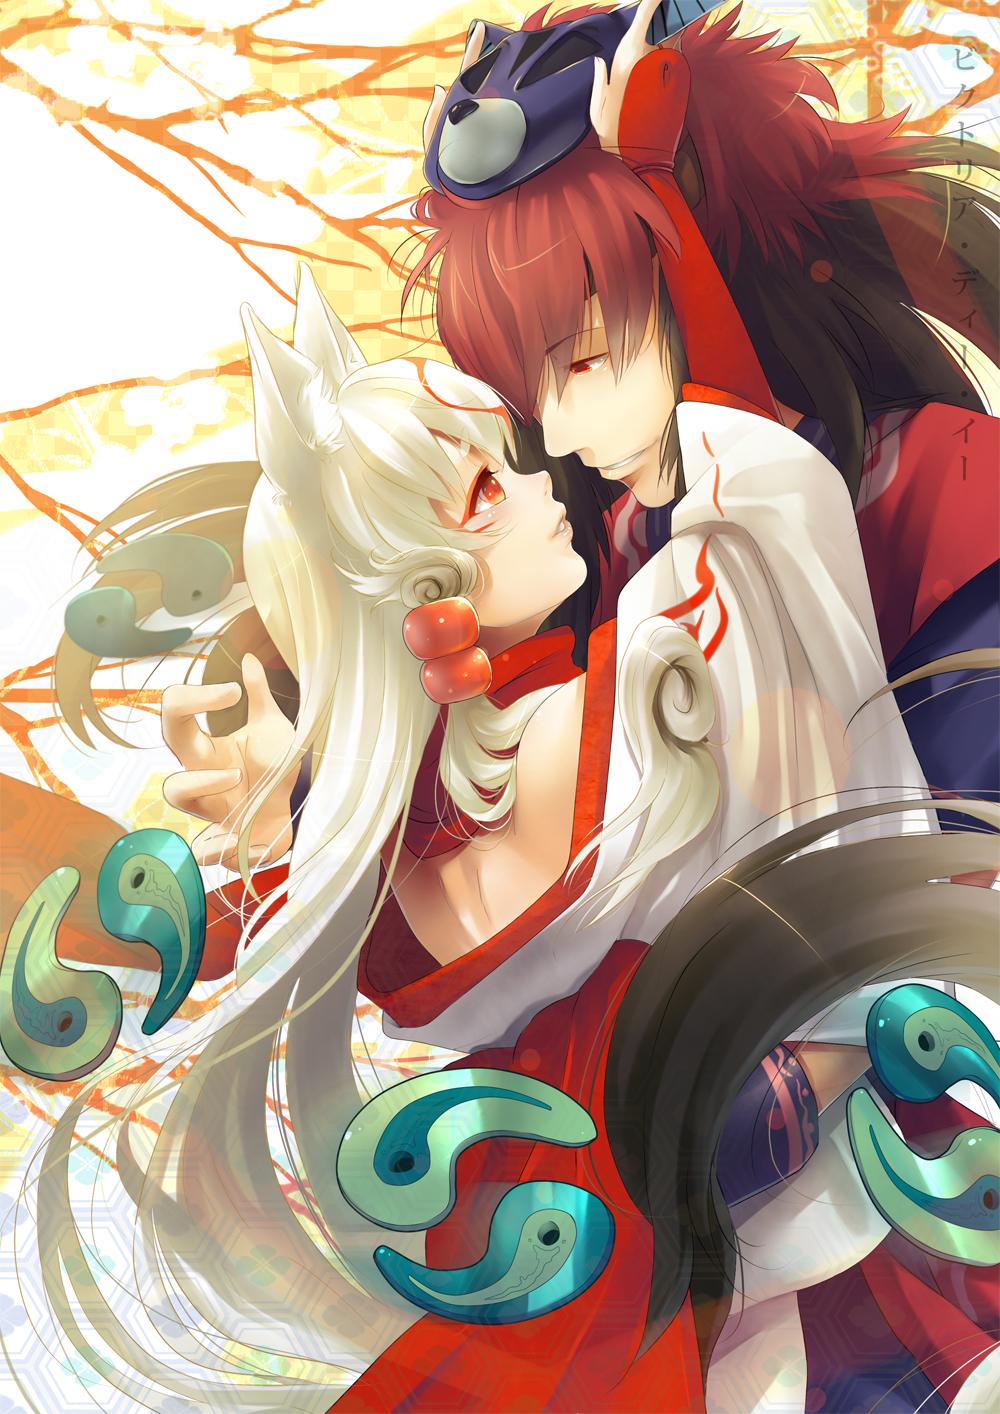 Okami Mobile Wallpaper 1407334 Zerochan Anime Image Board